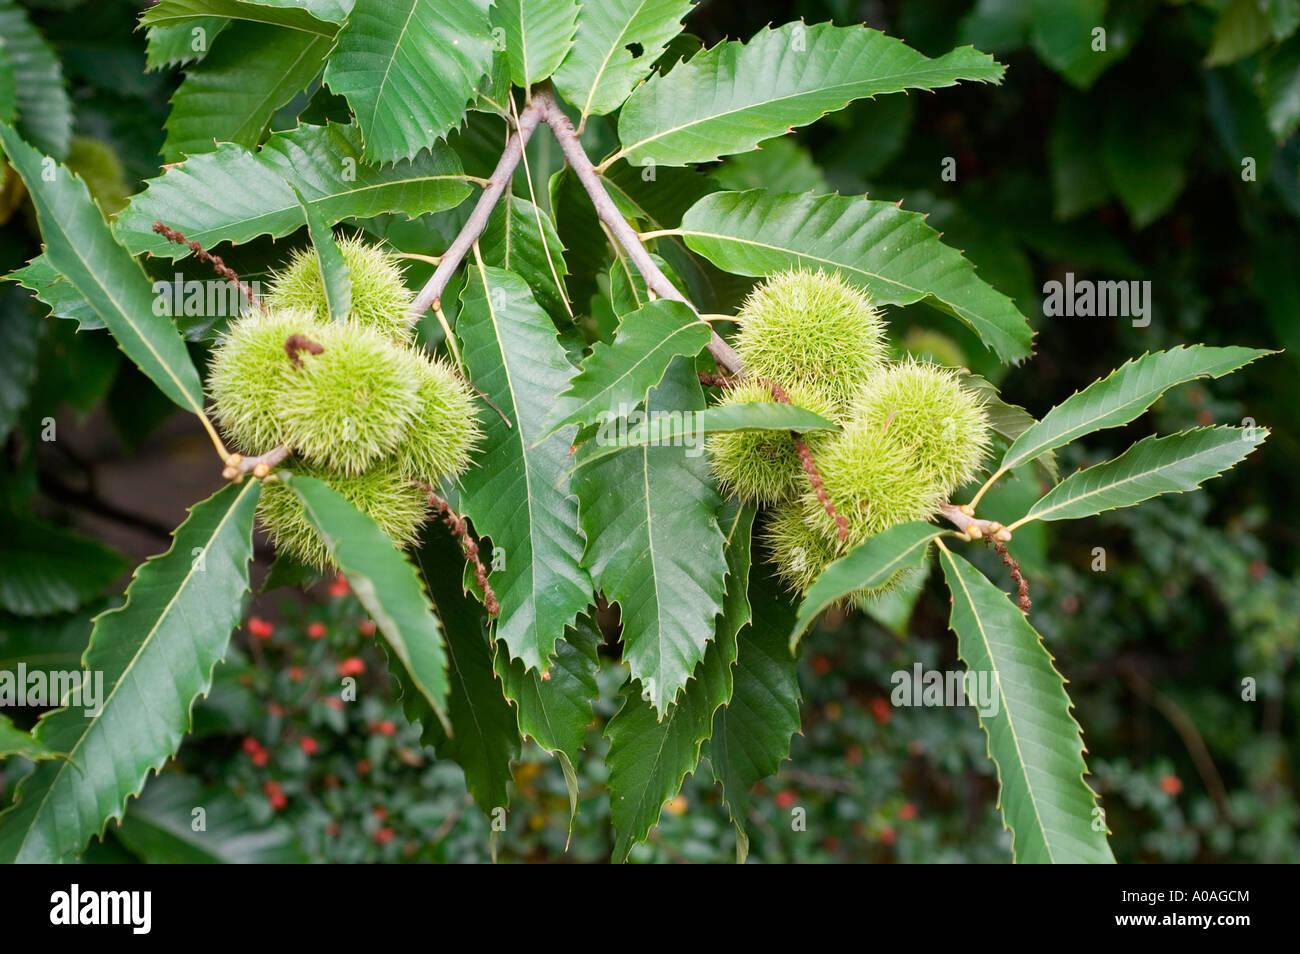 Sweet chestnut tree with nutshells and leaves fagaceae castanea sativa Stock Photo